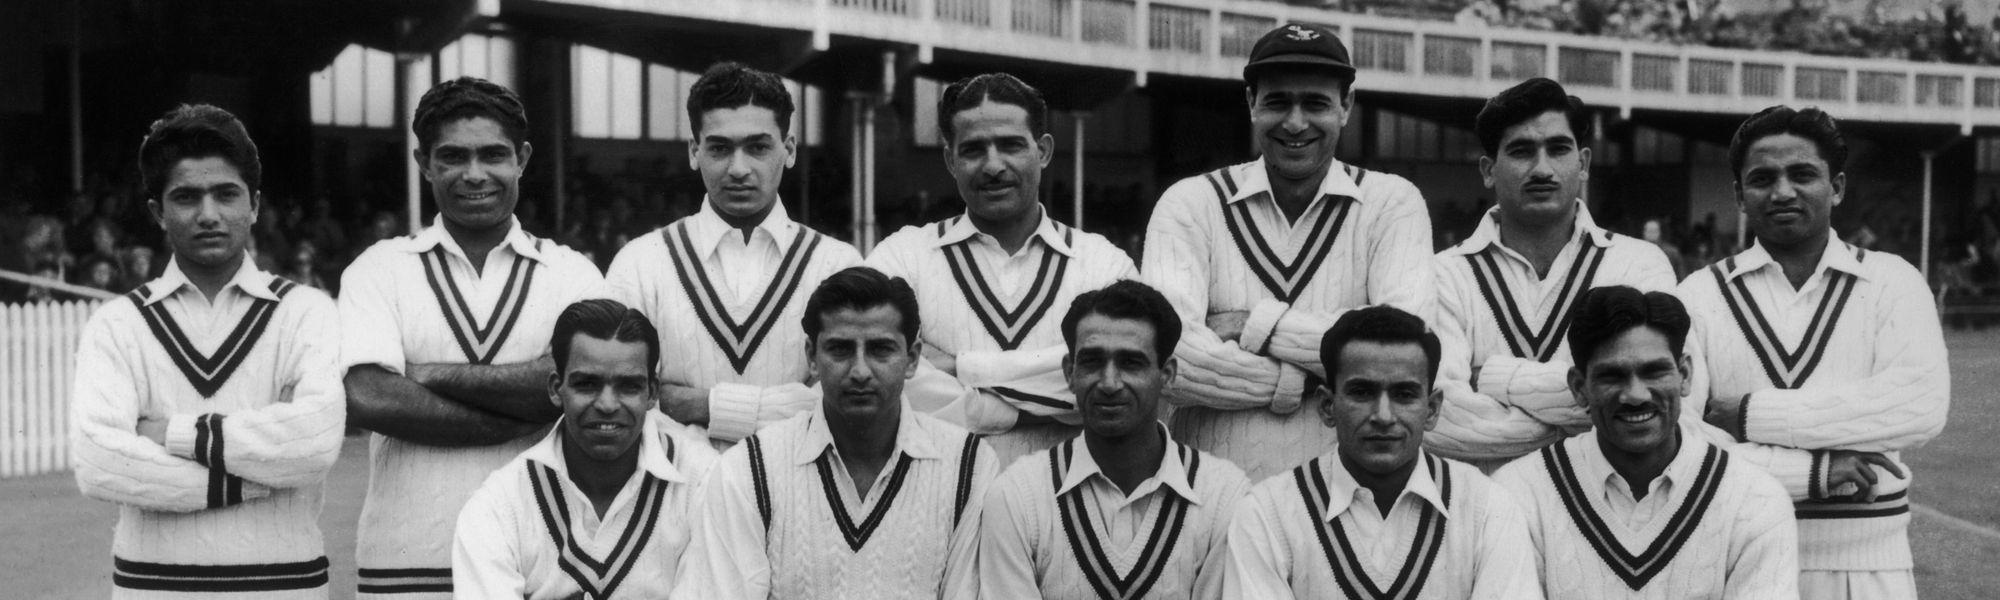 Pakistan's inaugural Test XI